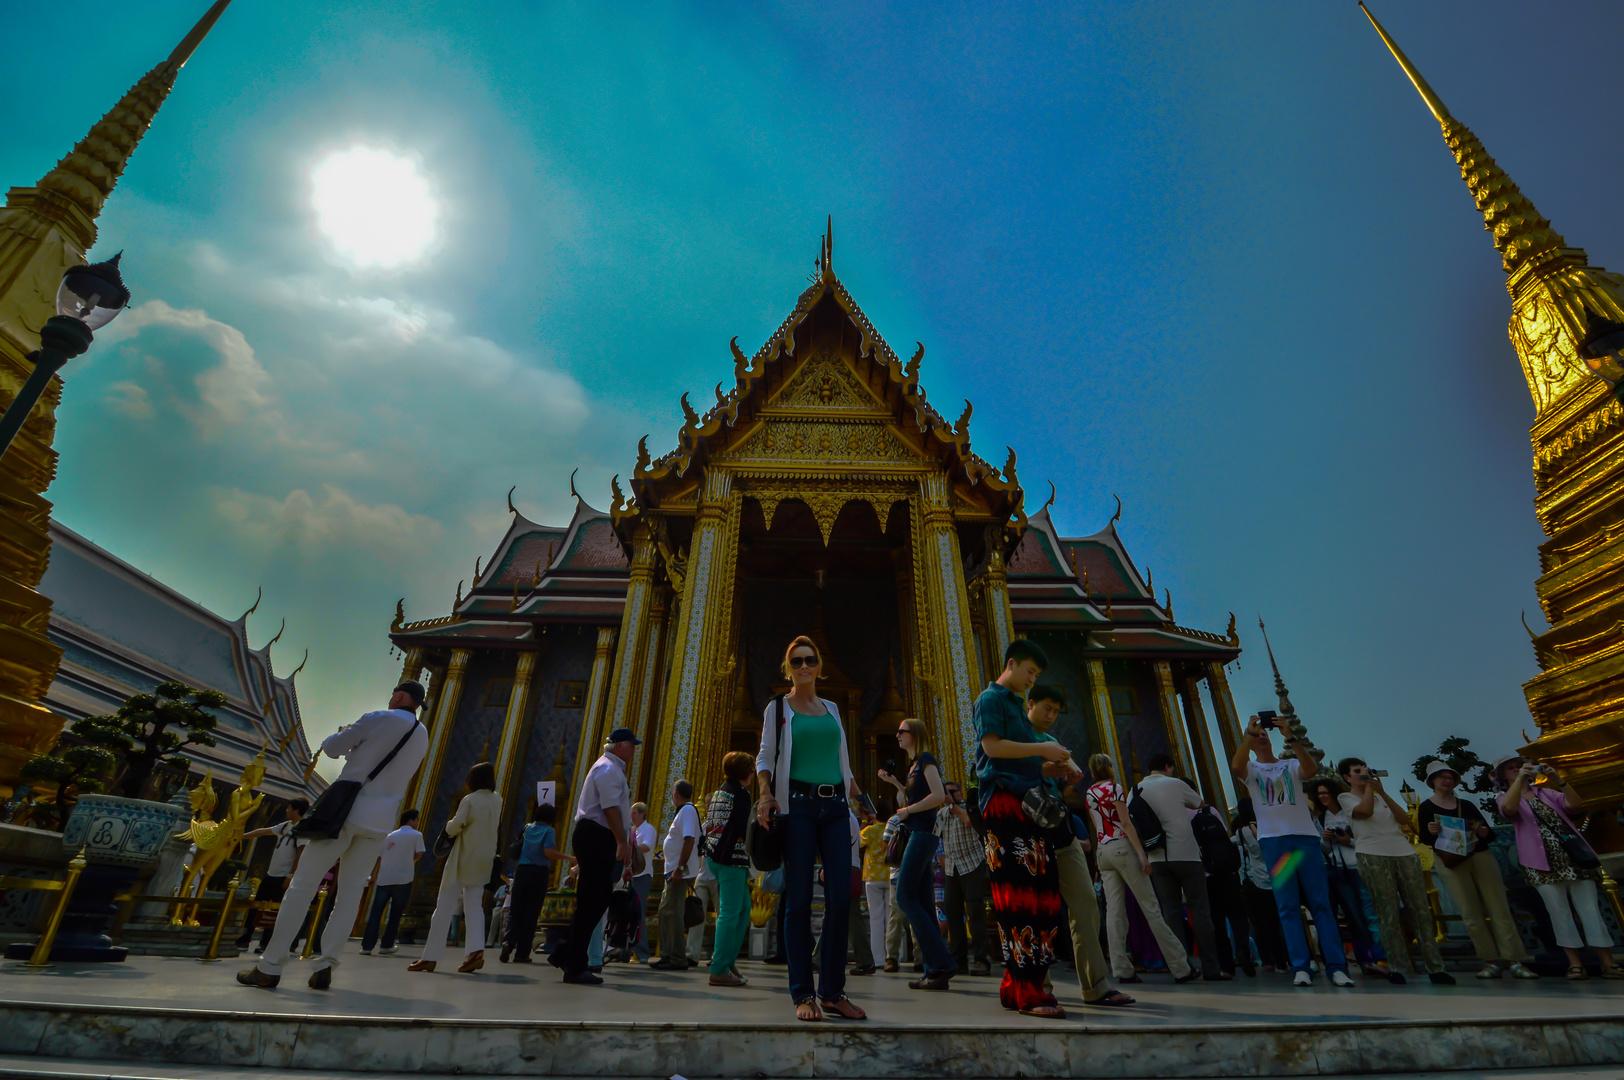 Königspalast Bangkok - Grand Palace